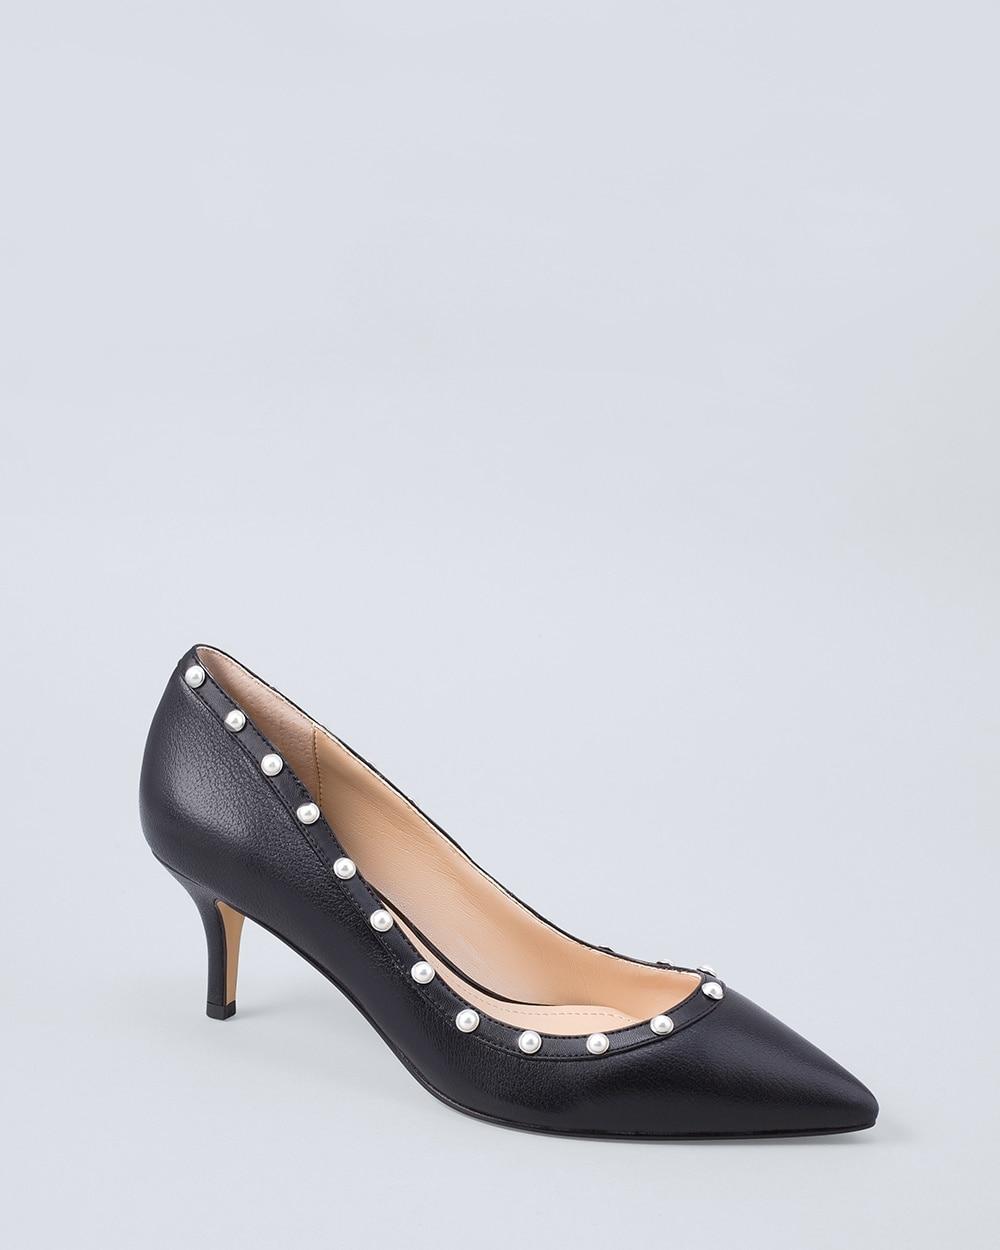 fa7ea9dd90b Women s Shoes   Accessories - White House Black Market